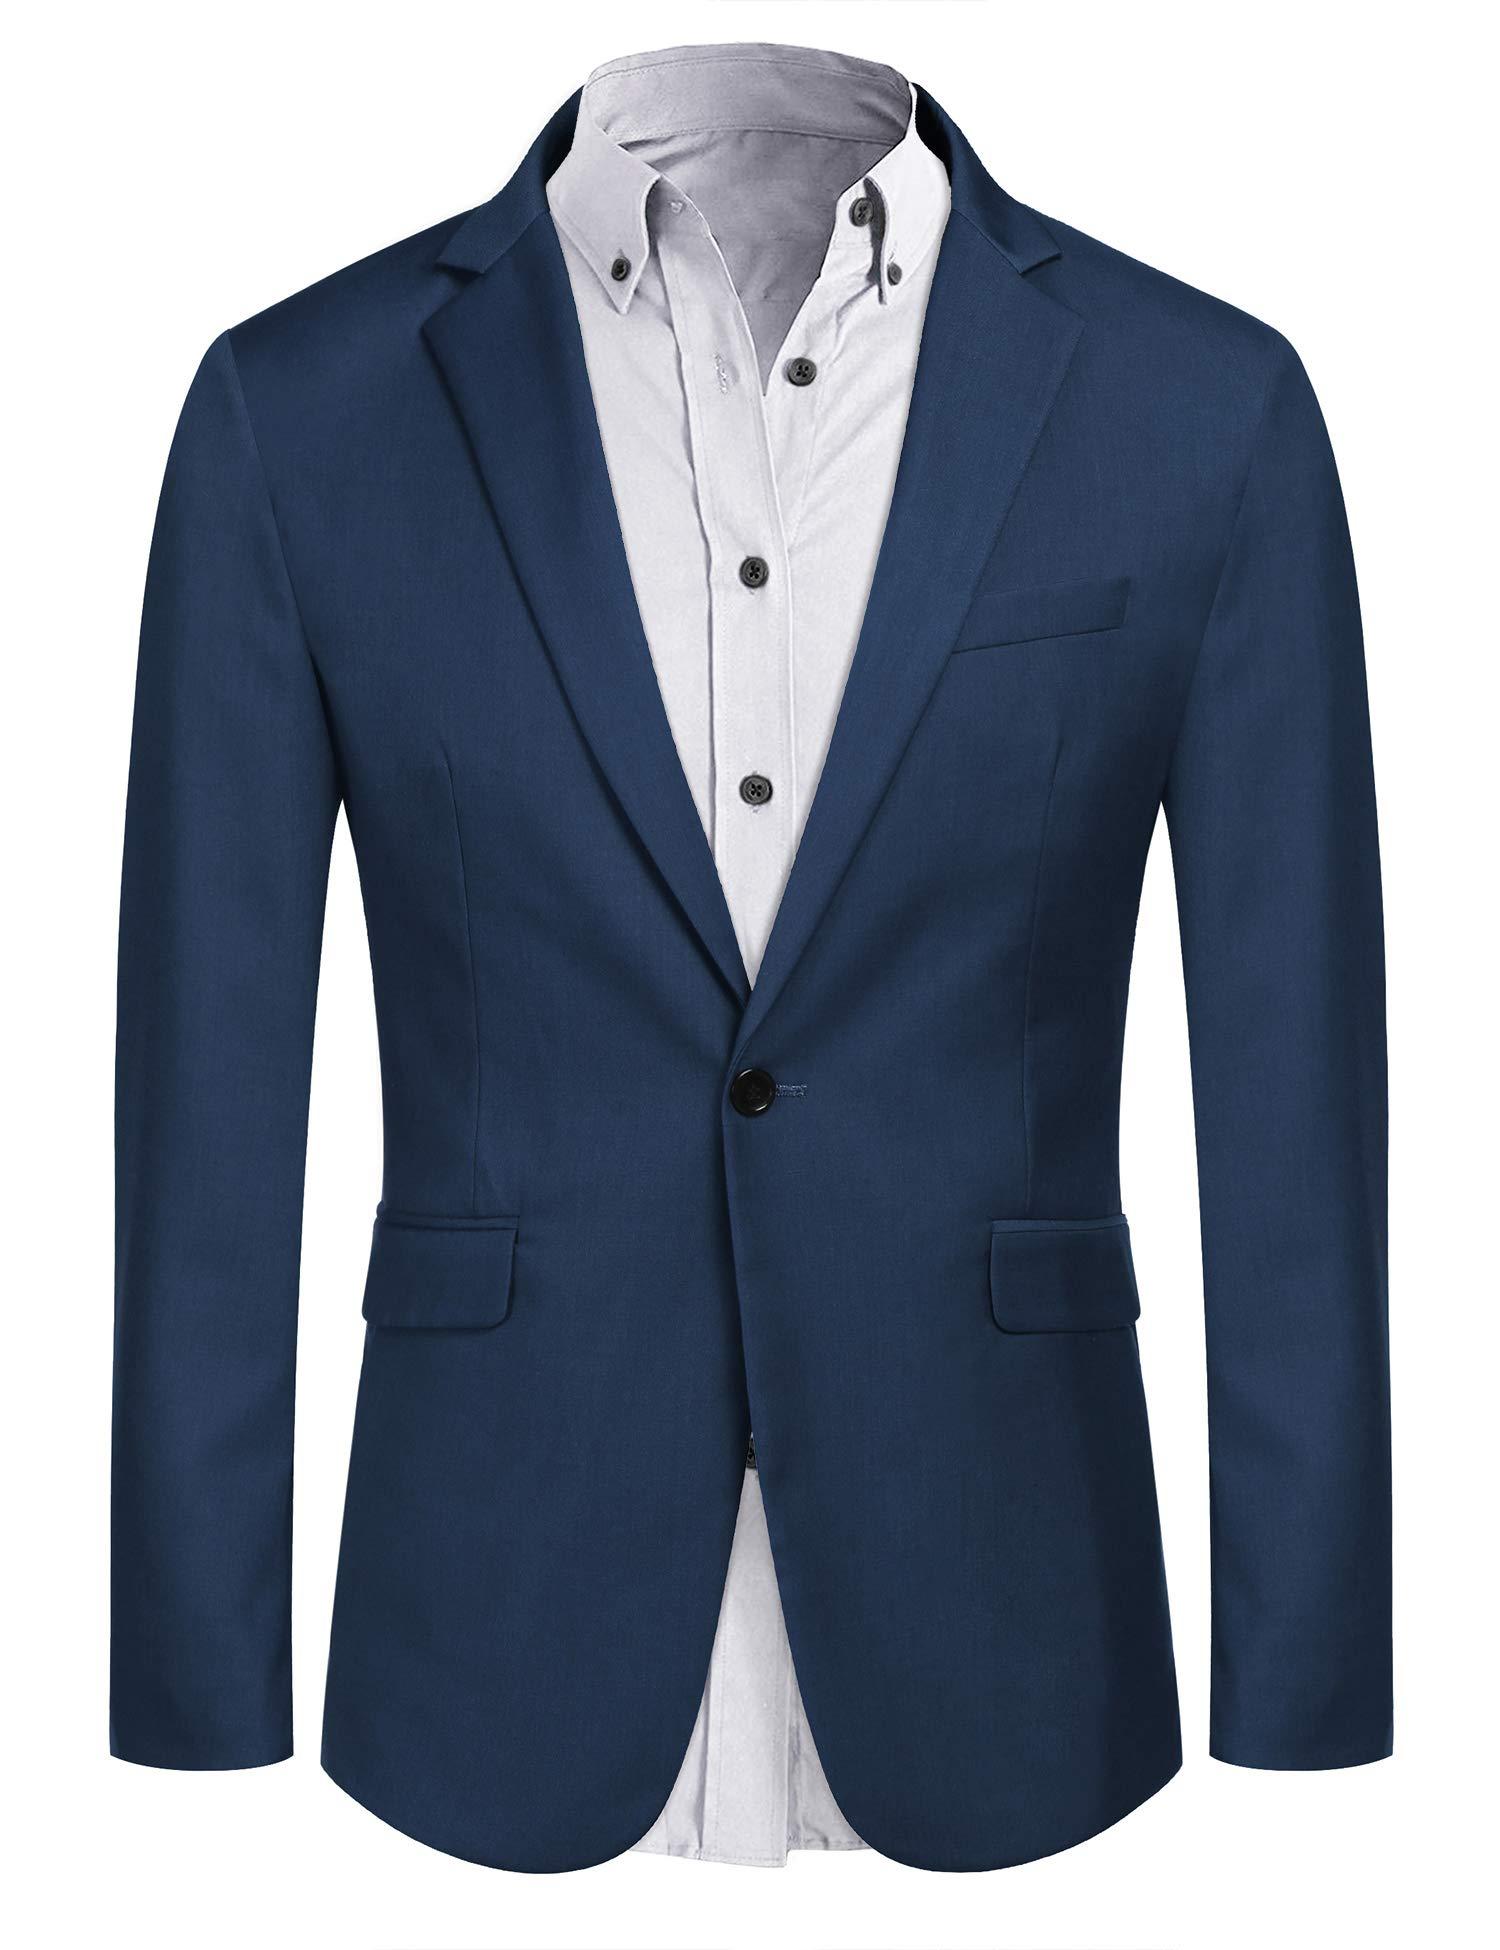 COOFANDY Mens Casual Blazer Fashion Sport Coats Slim Fit Business Suit Jacket (Blue XXXL) by COOFANDY